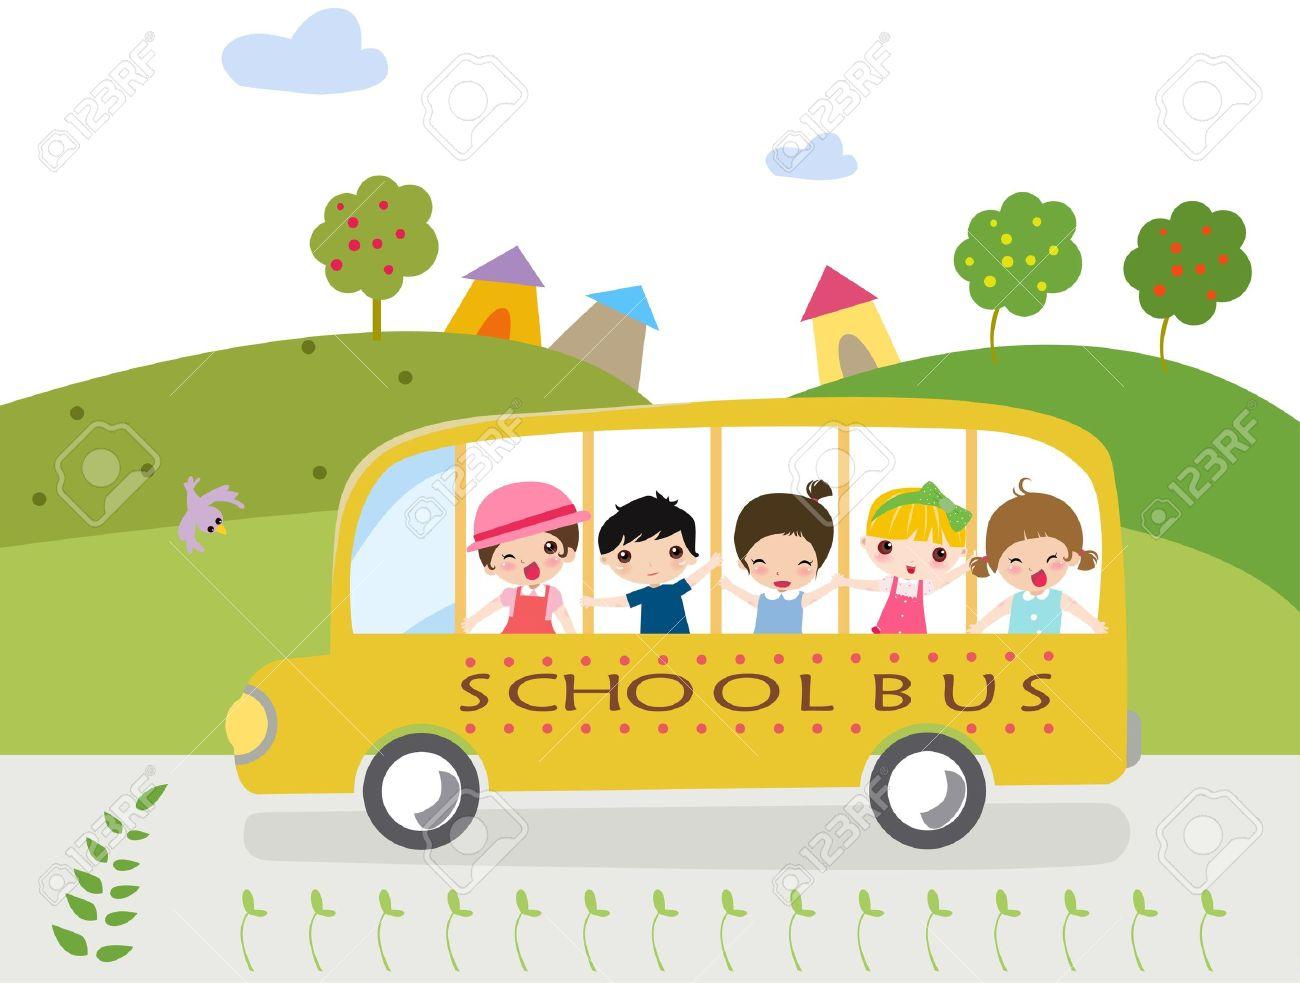 Cartoon school bus with kids - illustration. Stock Vector - 8887157